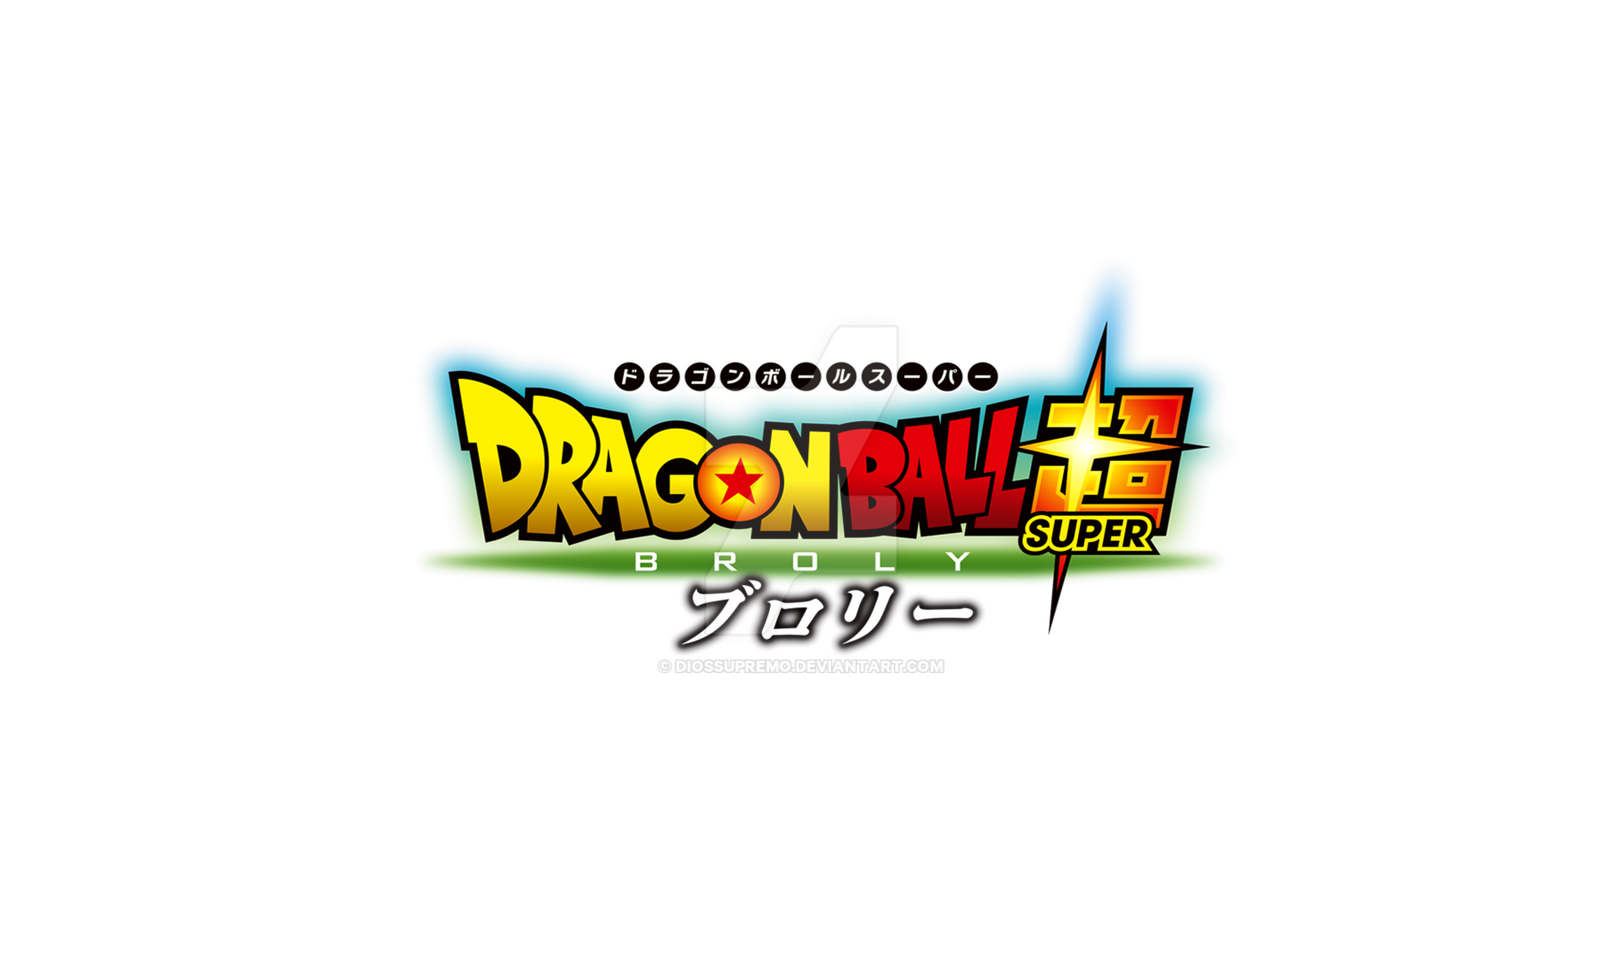 Dragon Ball Super Logo Png: Logo Dragon Ball Super Broly Movie 2018 By DiosSupremo On